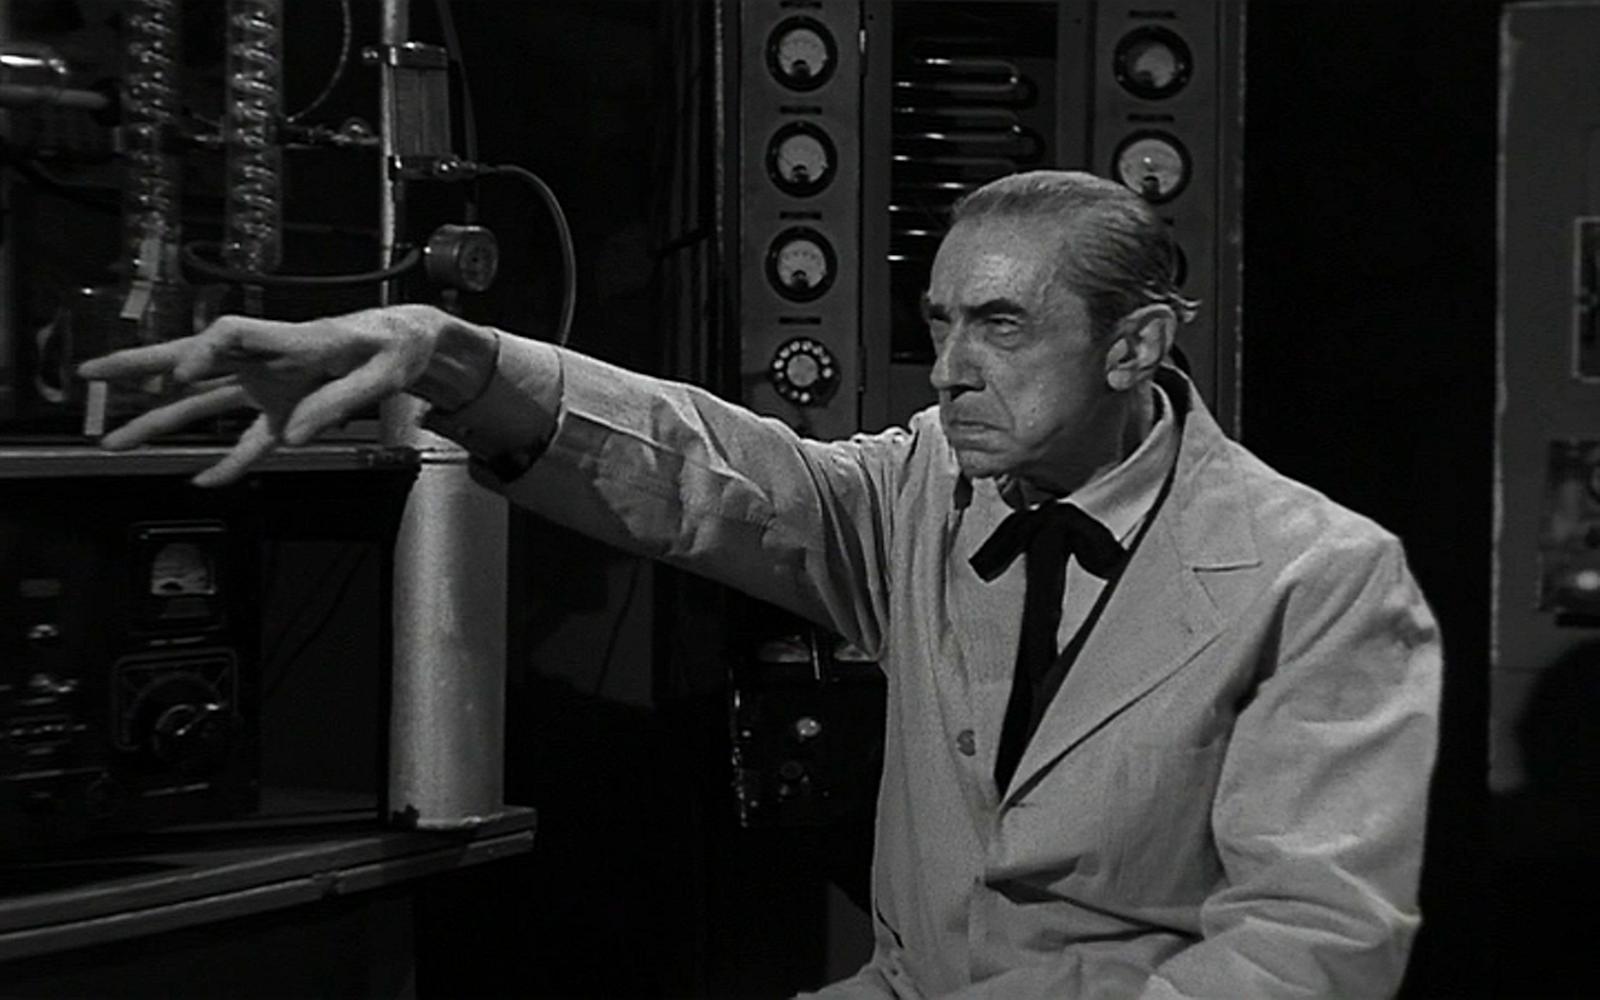 Bride of the Monster - Bela Lugosi's Hands